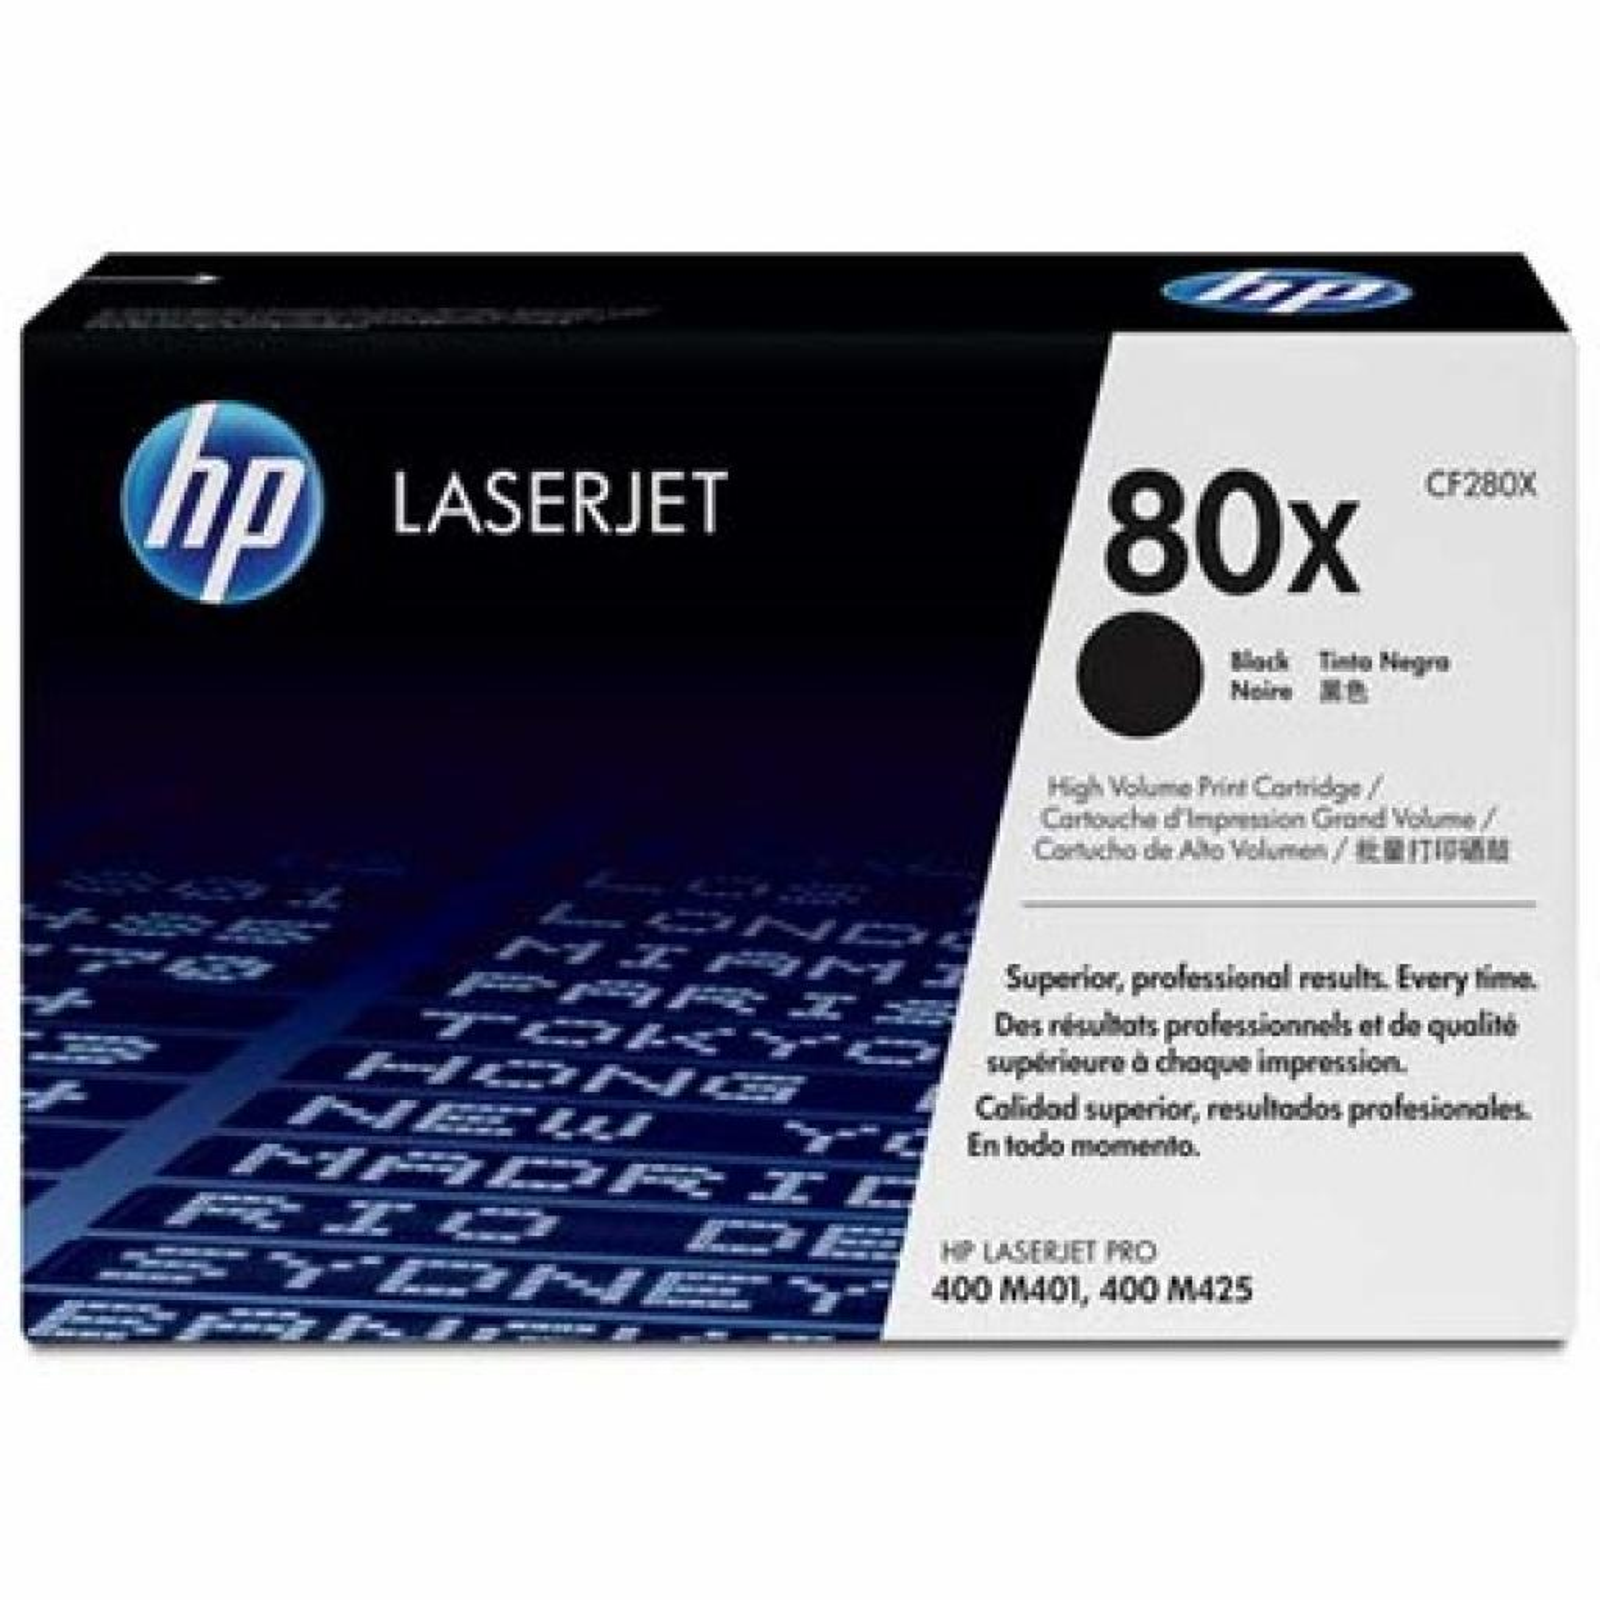 Картридж HP LJ Pro 400 M401/Pro 400 MFP M425 (CF280X)